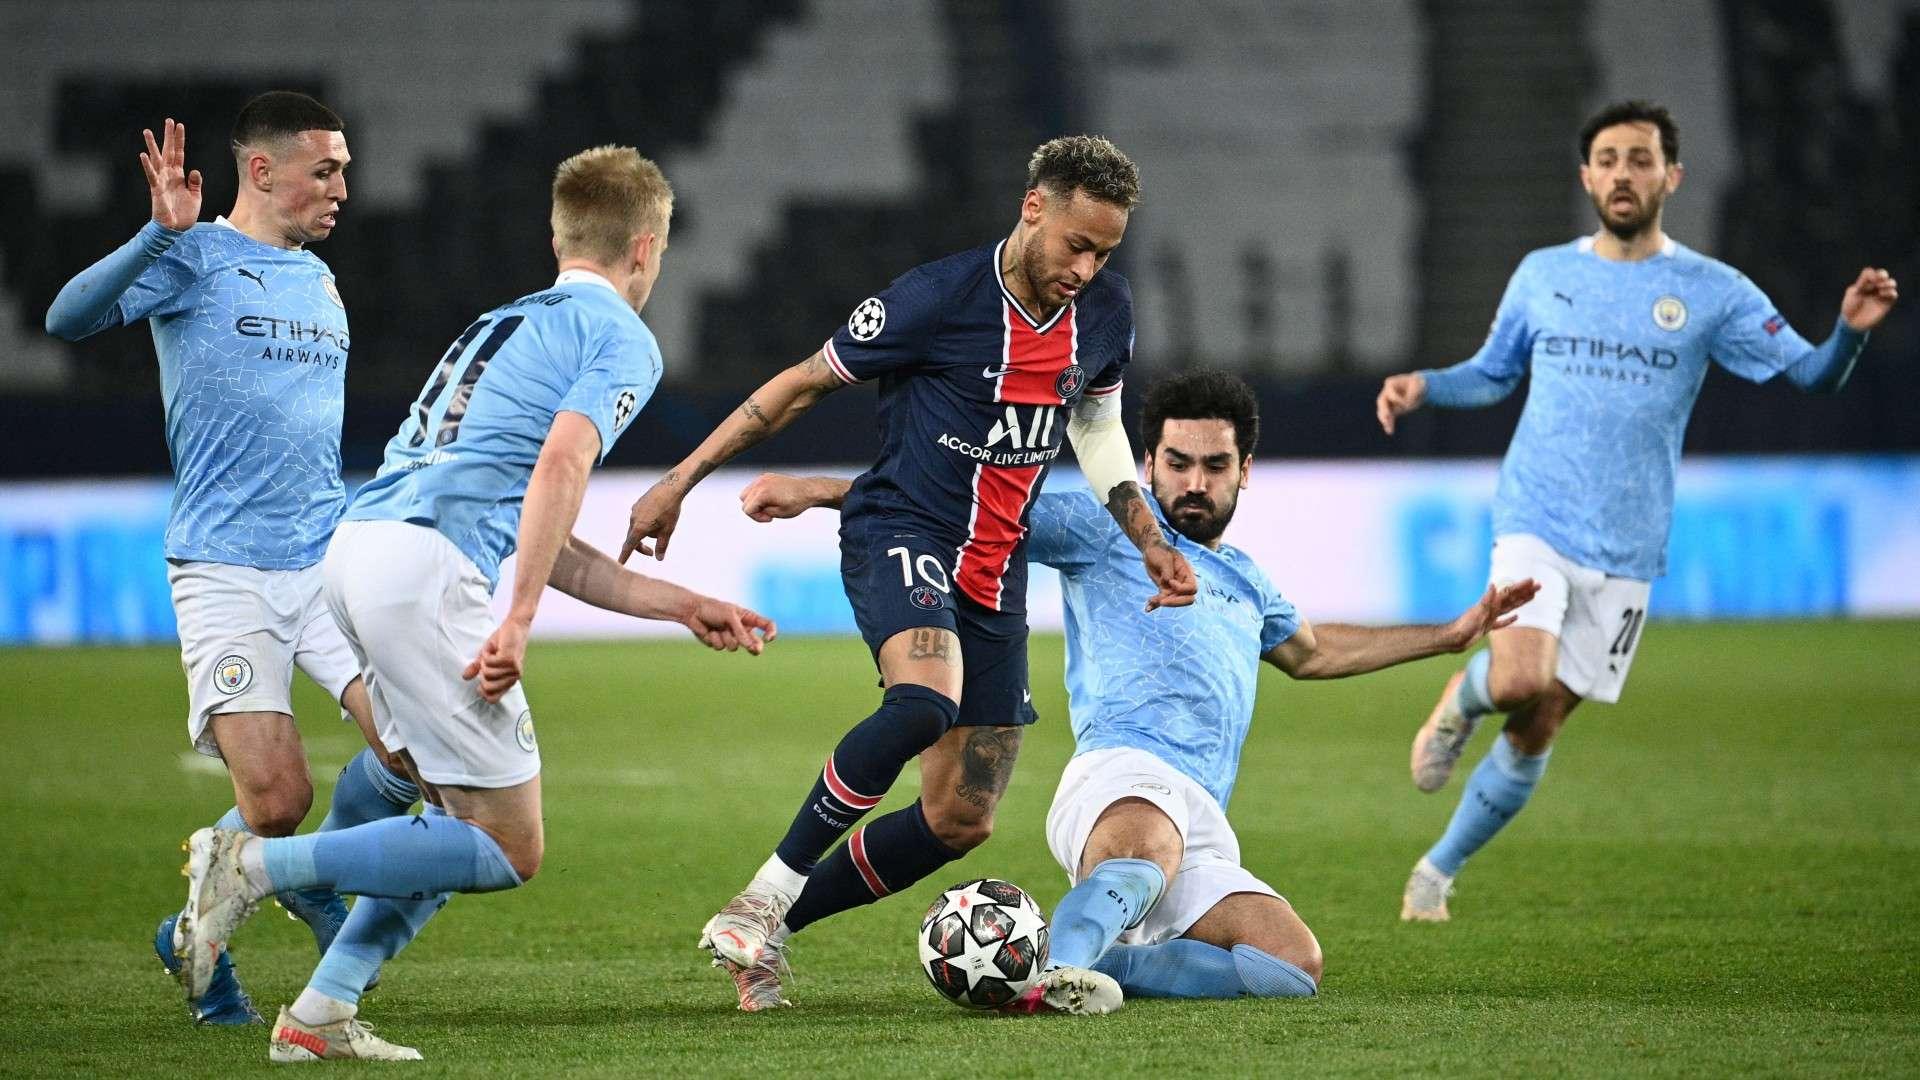 neymar-psg-manchester-city-champions-league-ida-semifinal-28-04-2021_1jr5z6z69kdh51sfmgrpbbahc8